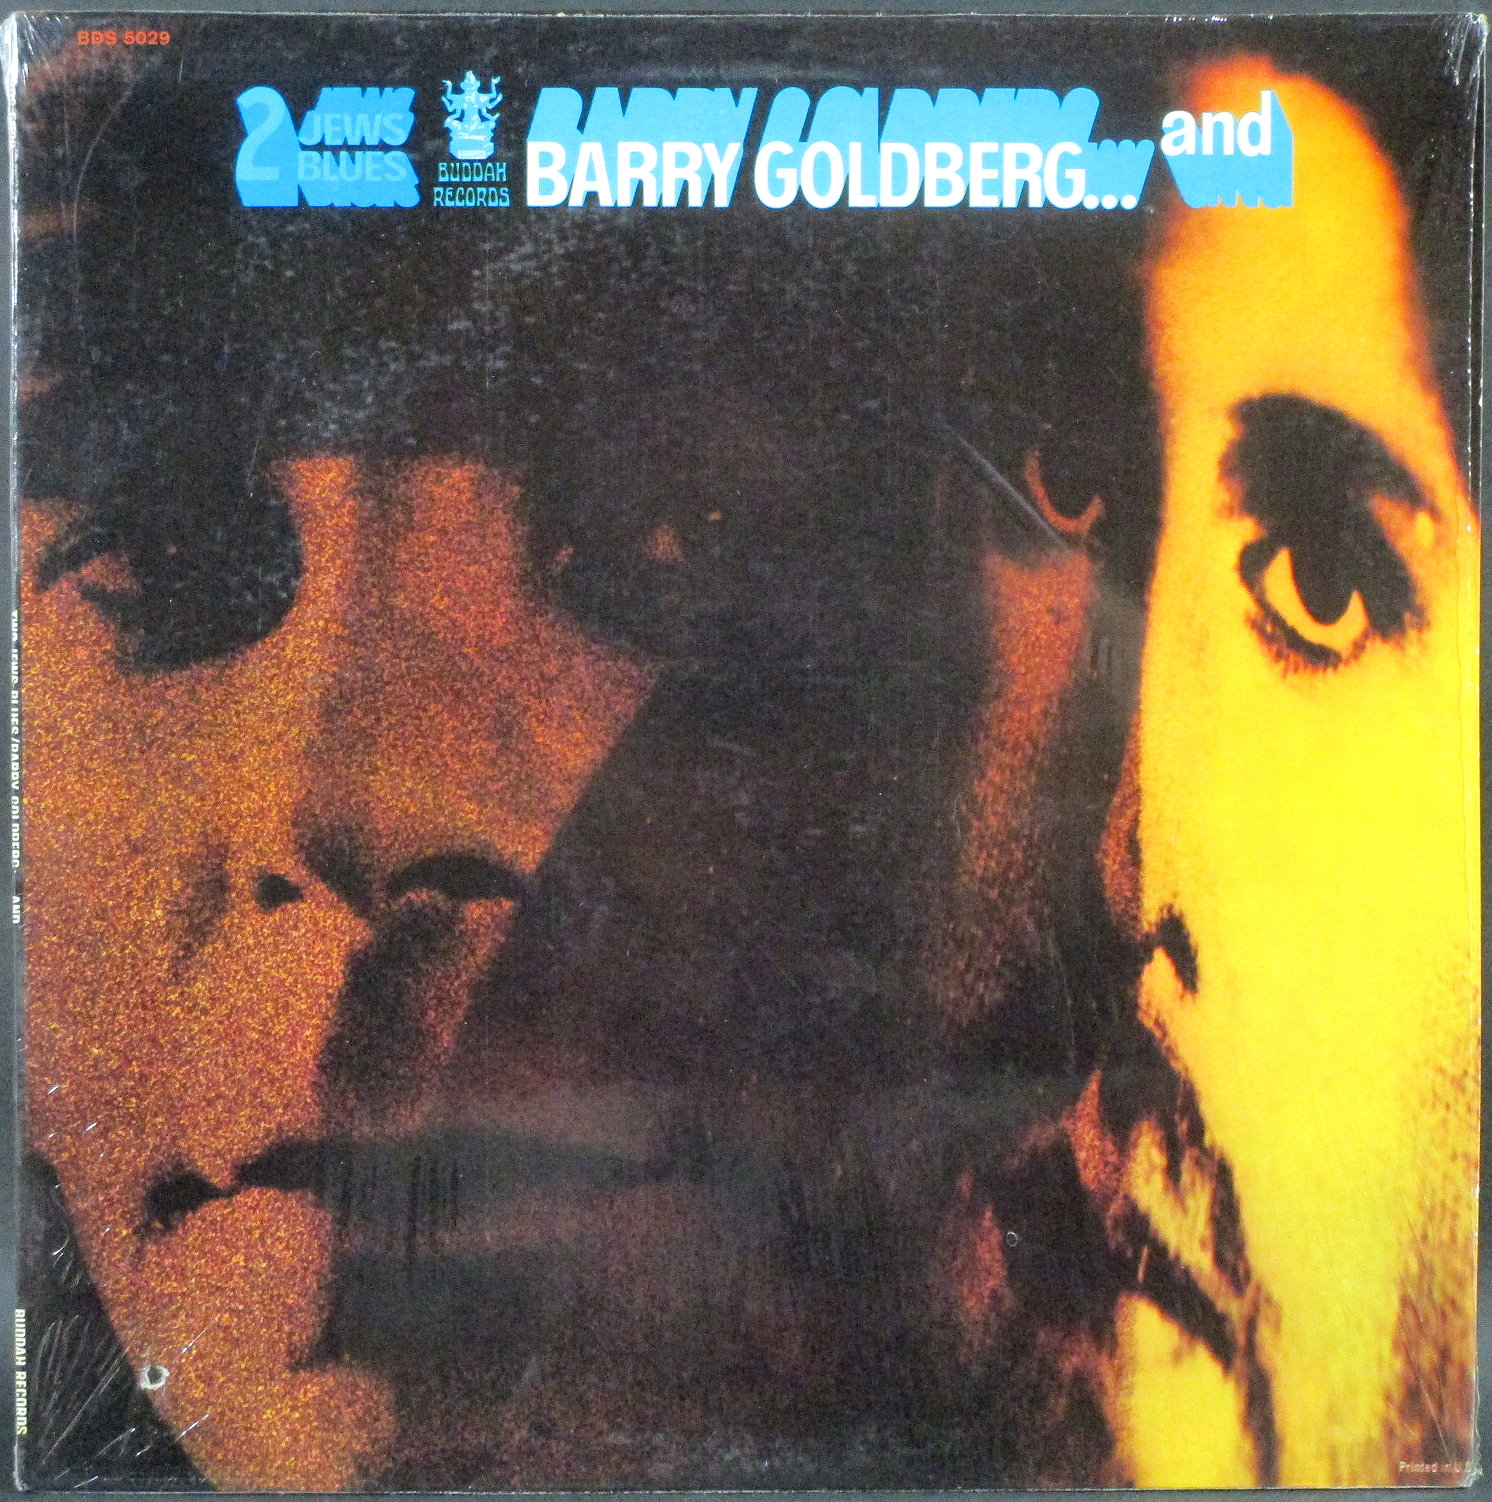 Barry Goldberg バリー・ゴールドバーグ / Two Jews Blues